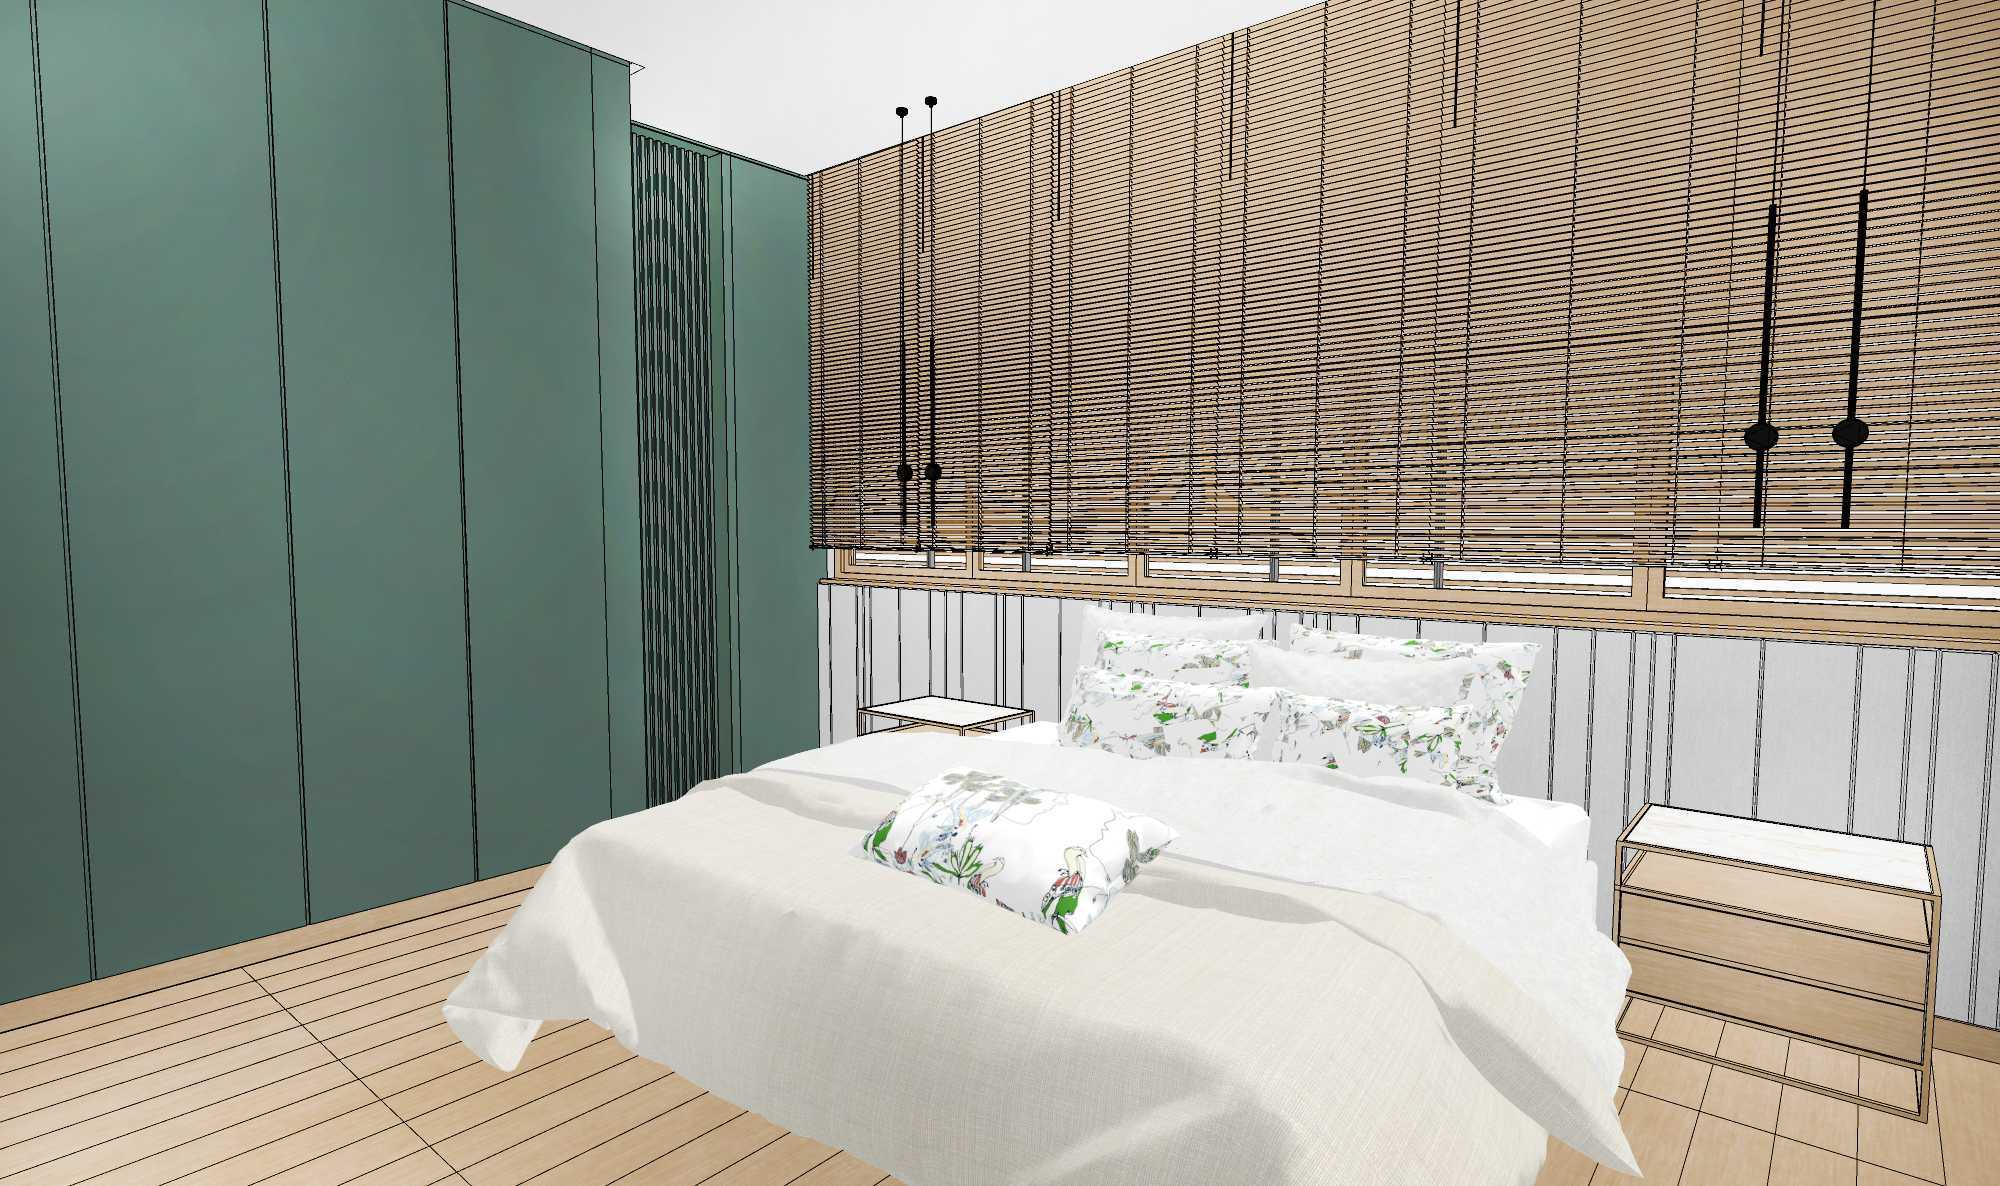 Aksioma Design & Construction D + T House Jakarta Selatan, Kota Jakarta Selatan, Daerah Khusus Ibukota Jakarta, Indonesia Jakarta Selatan, Kota Jakarta Selatan, Daerah Khusus Ibukota Jakarta, Indonesia D + T House Master Bedroom Minimalist  78575